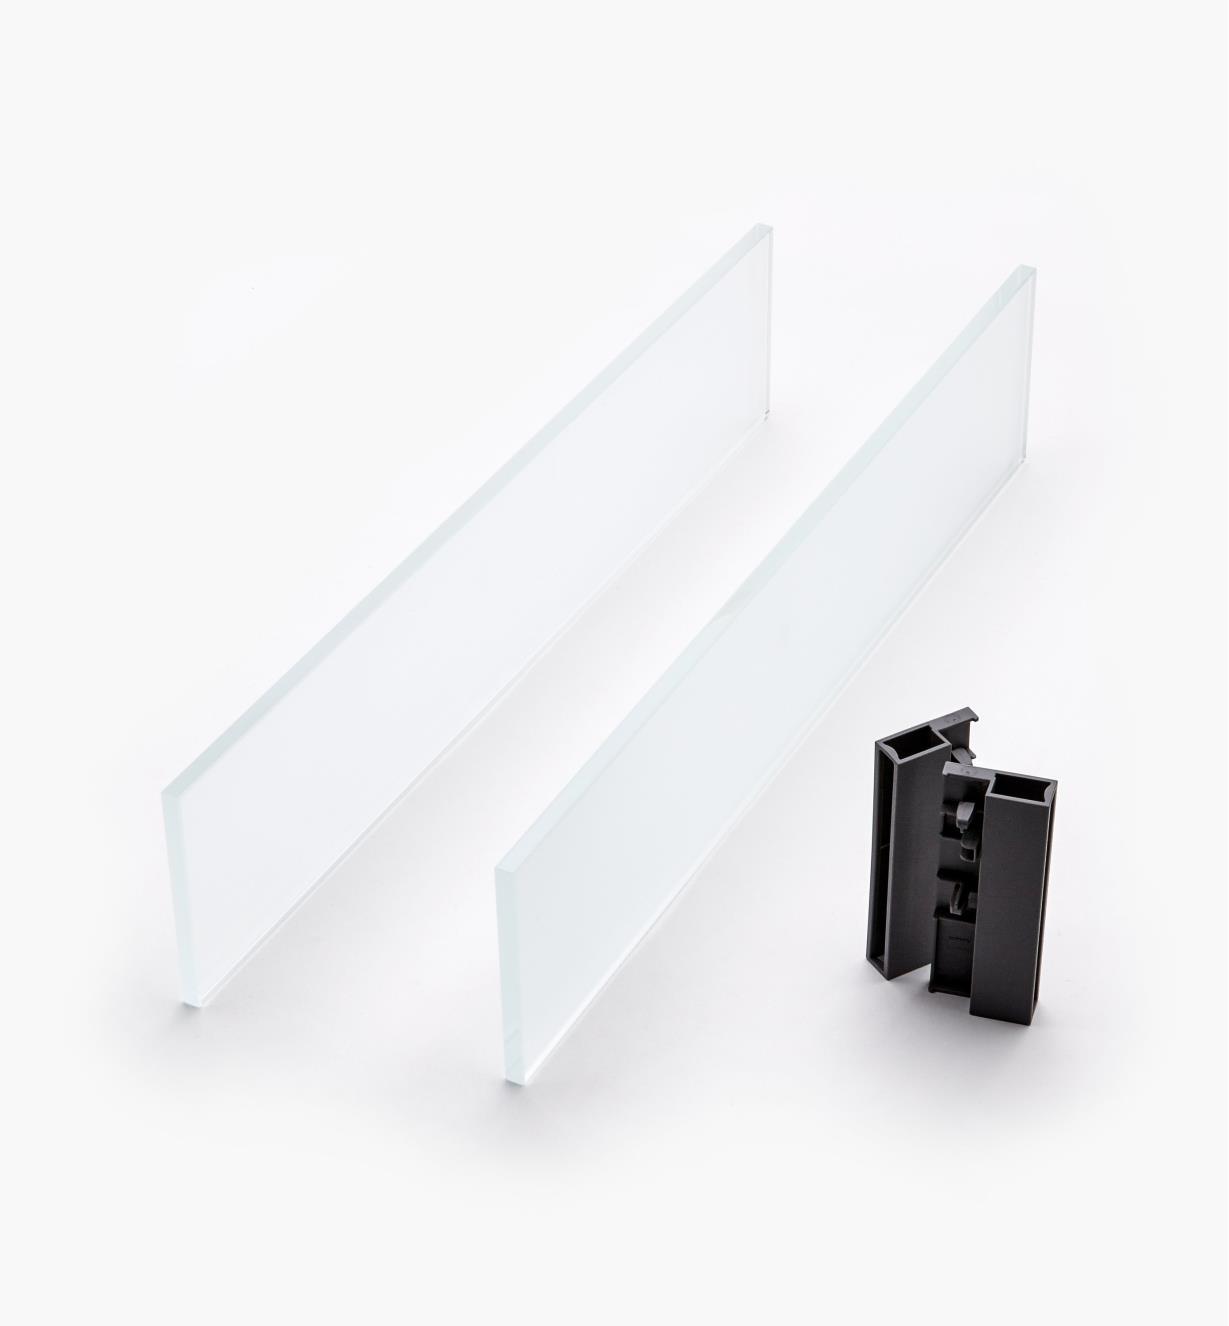 02K2846 - Glass Insert Panels for Blum Tandembox Antaro Soft-Close Type D 450mm Drawer Kit